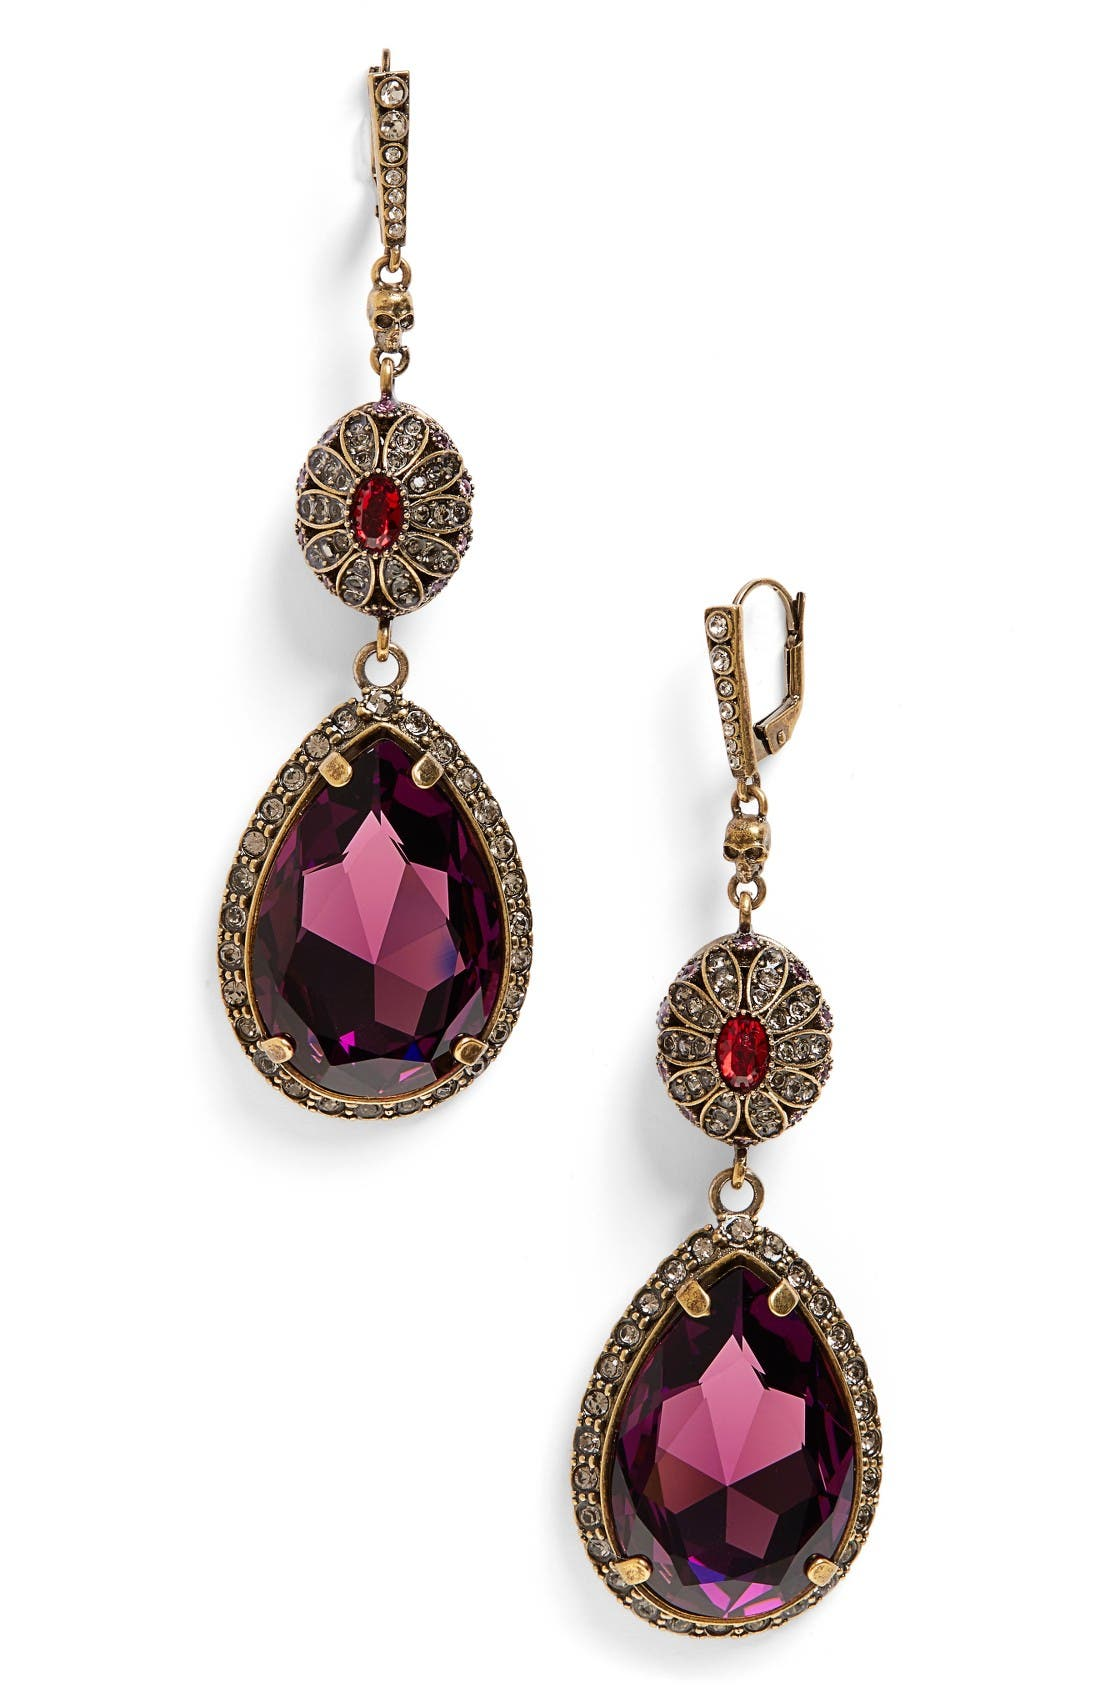 Alternate Image 1 Selected - Alexander McQueen Double Drop Earrings